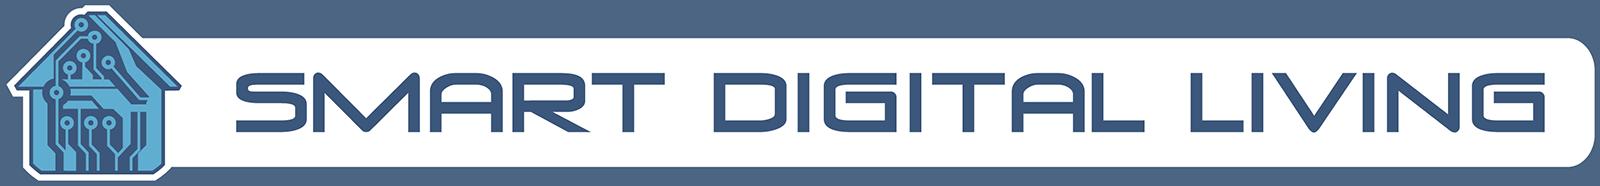 Smart Digital Living Logo